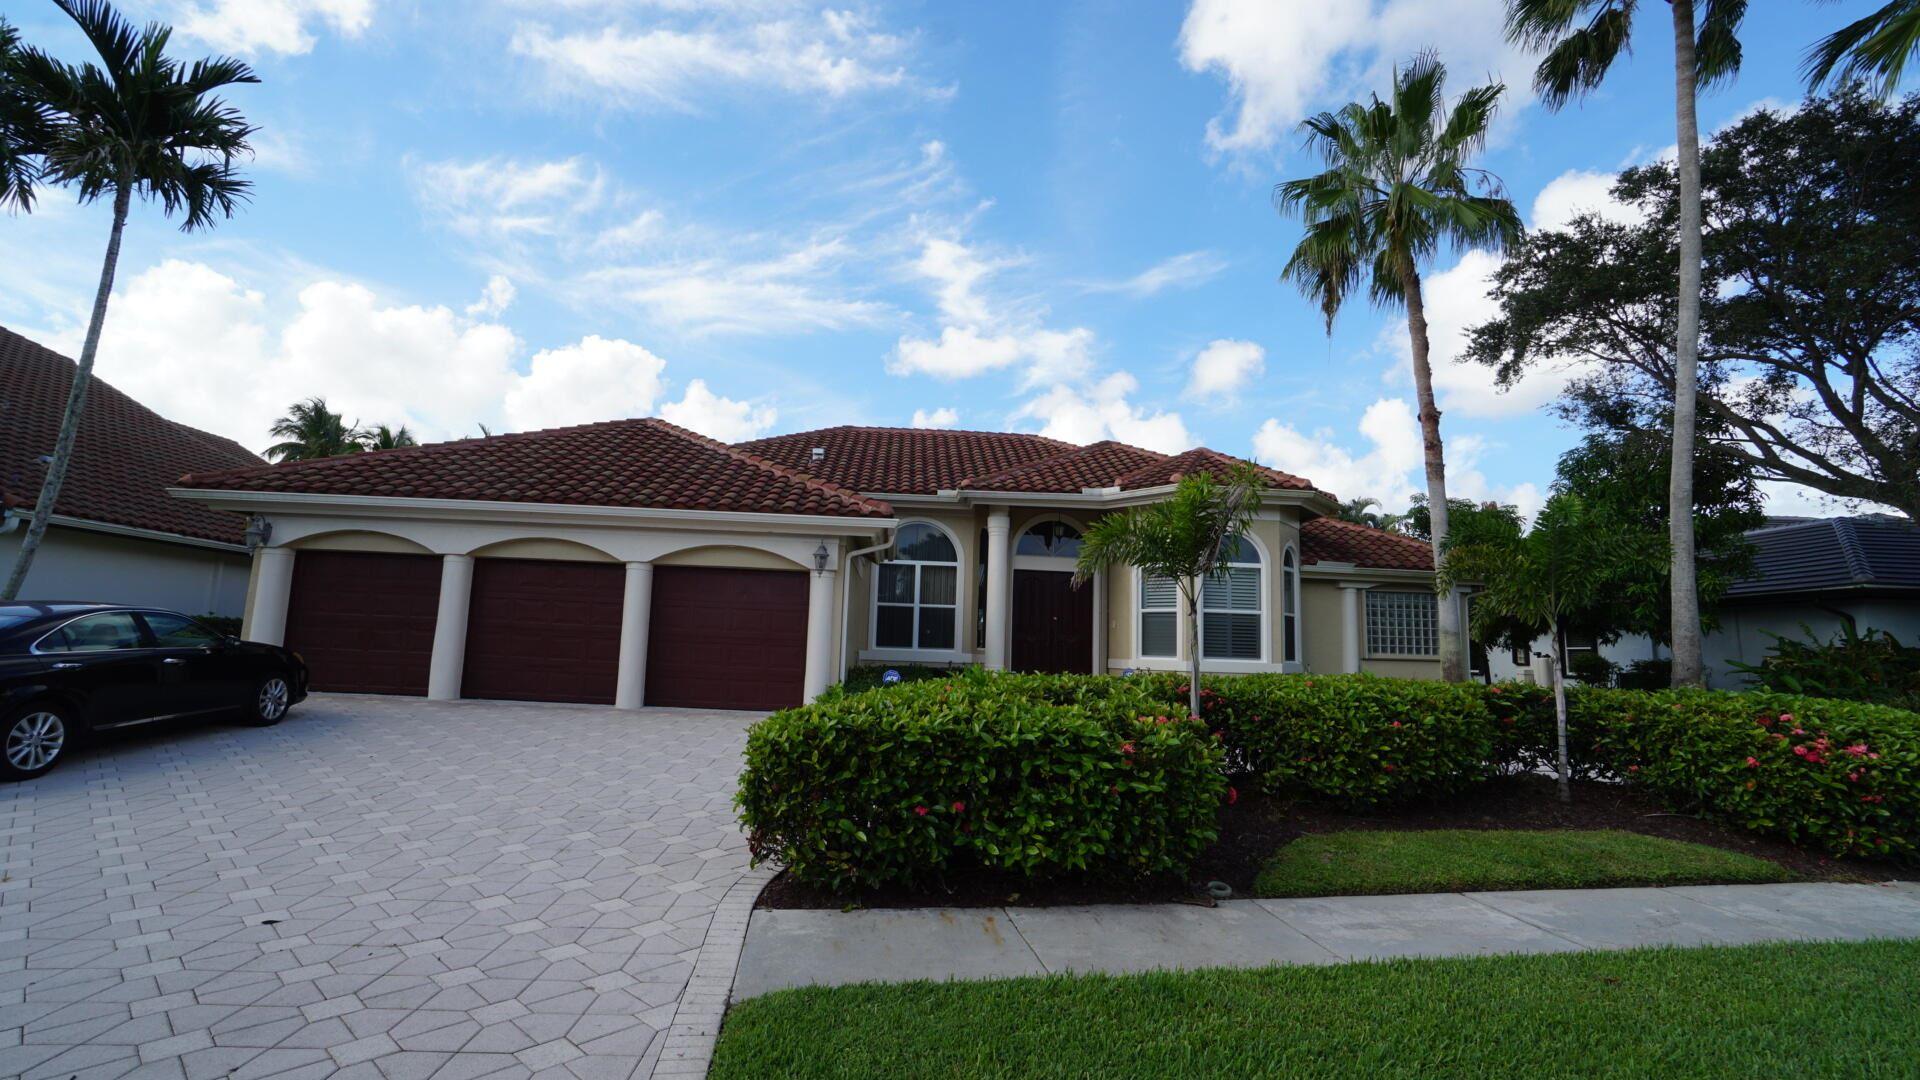 6695 Newport Lake Circle, Boca Raton, FL 33496 - MLS#: RX-10738356